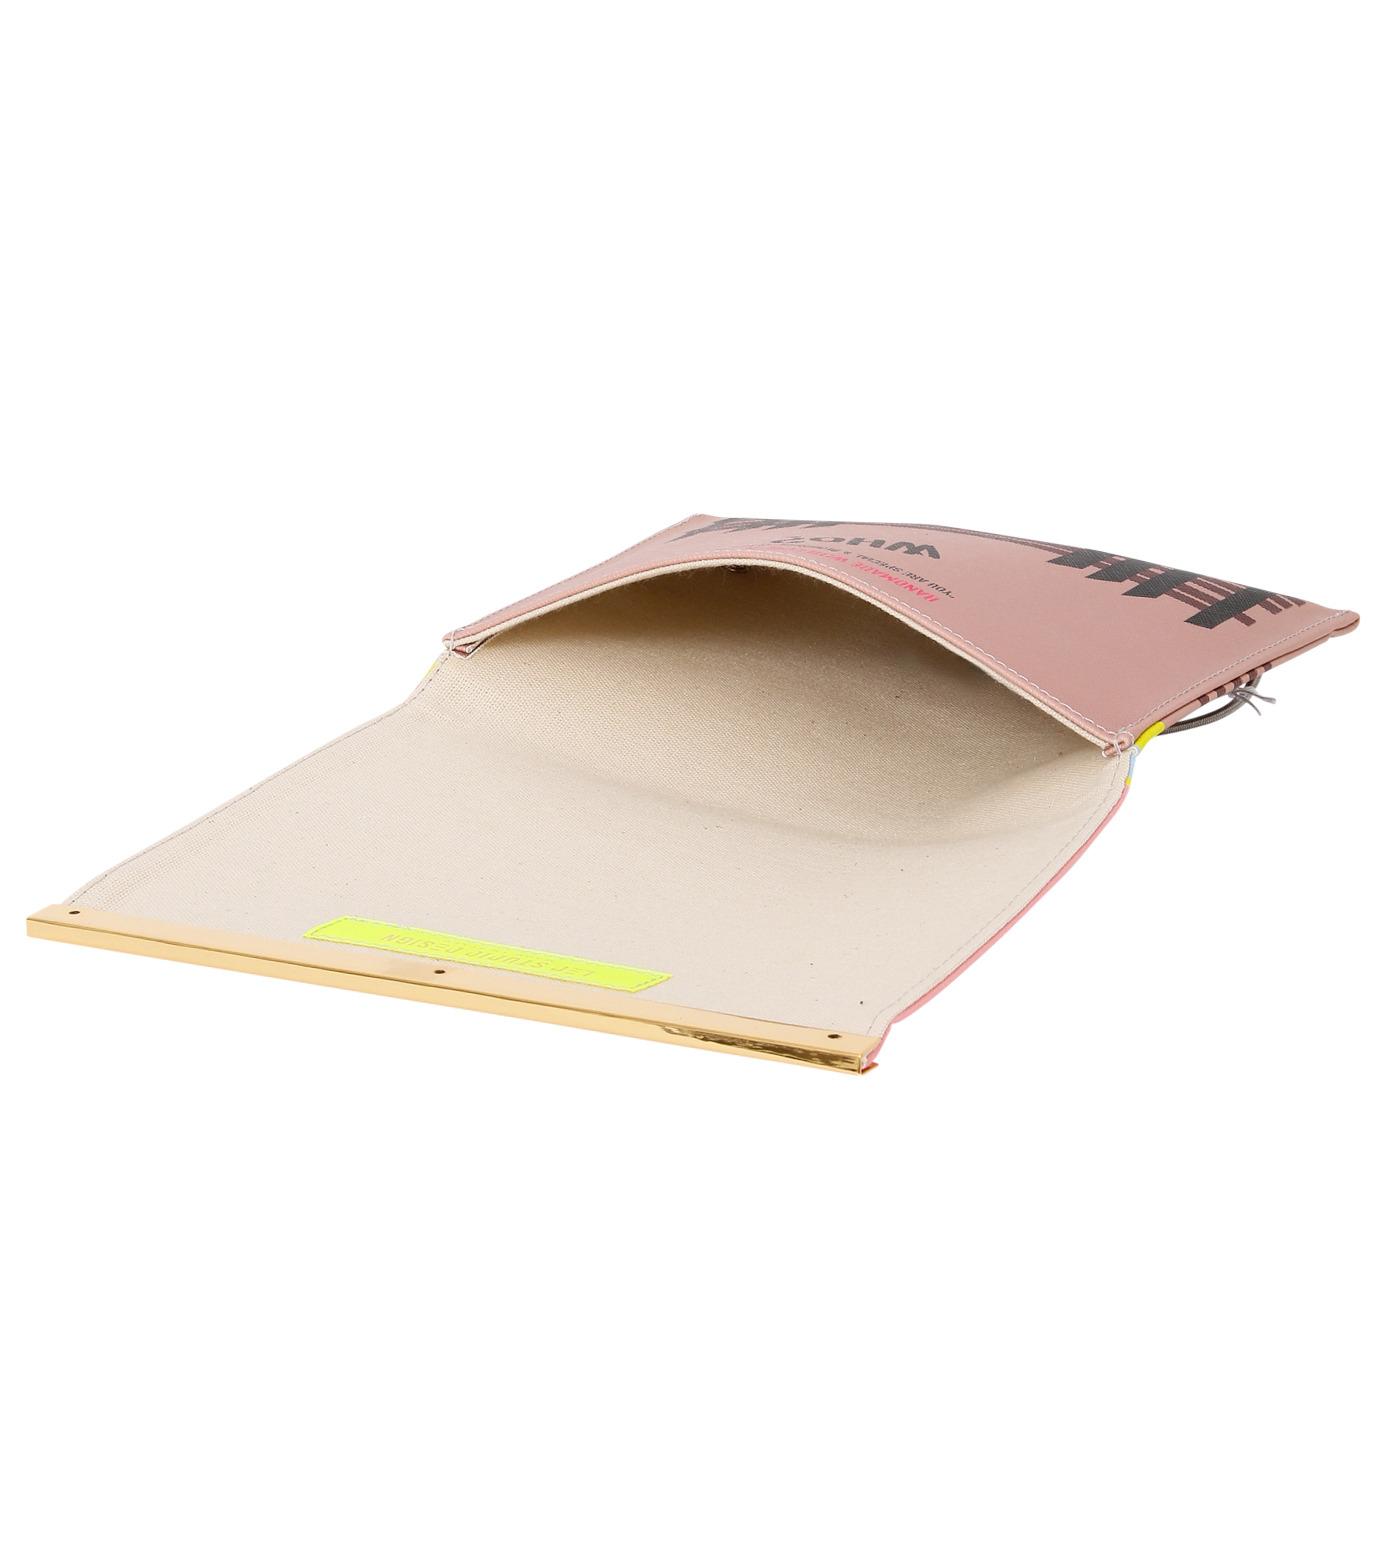 LEO(レオ)のMini Flap Bag Karl-PINK(クラッチバッグ/clutch bag)-FW16-009-72 拡大詳細画像4